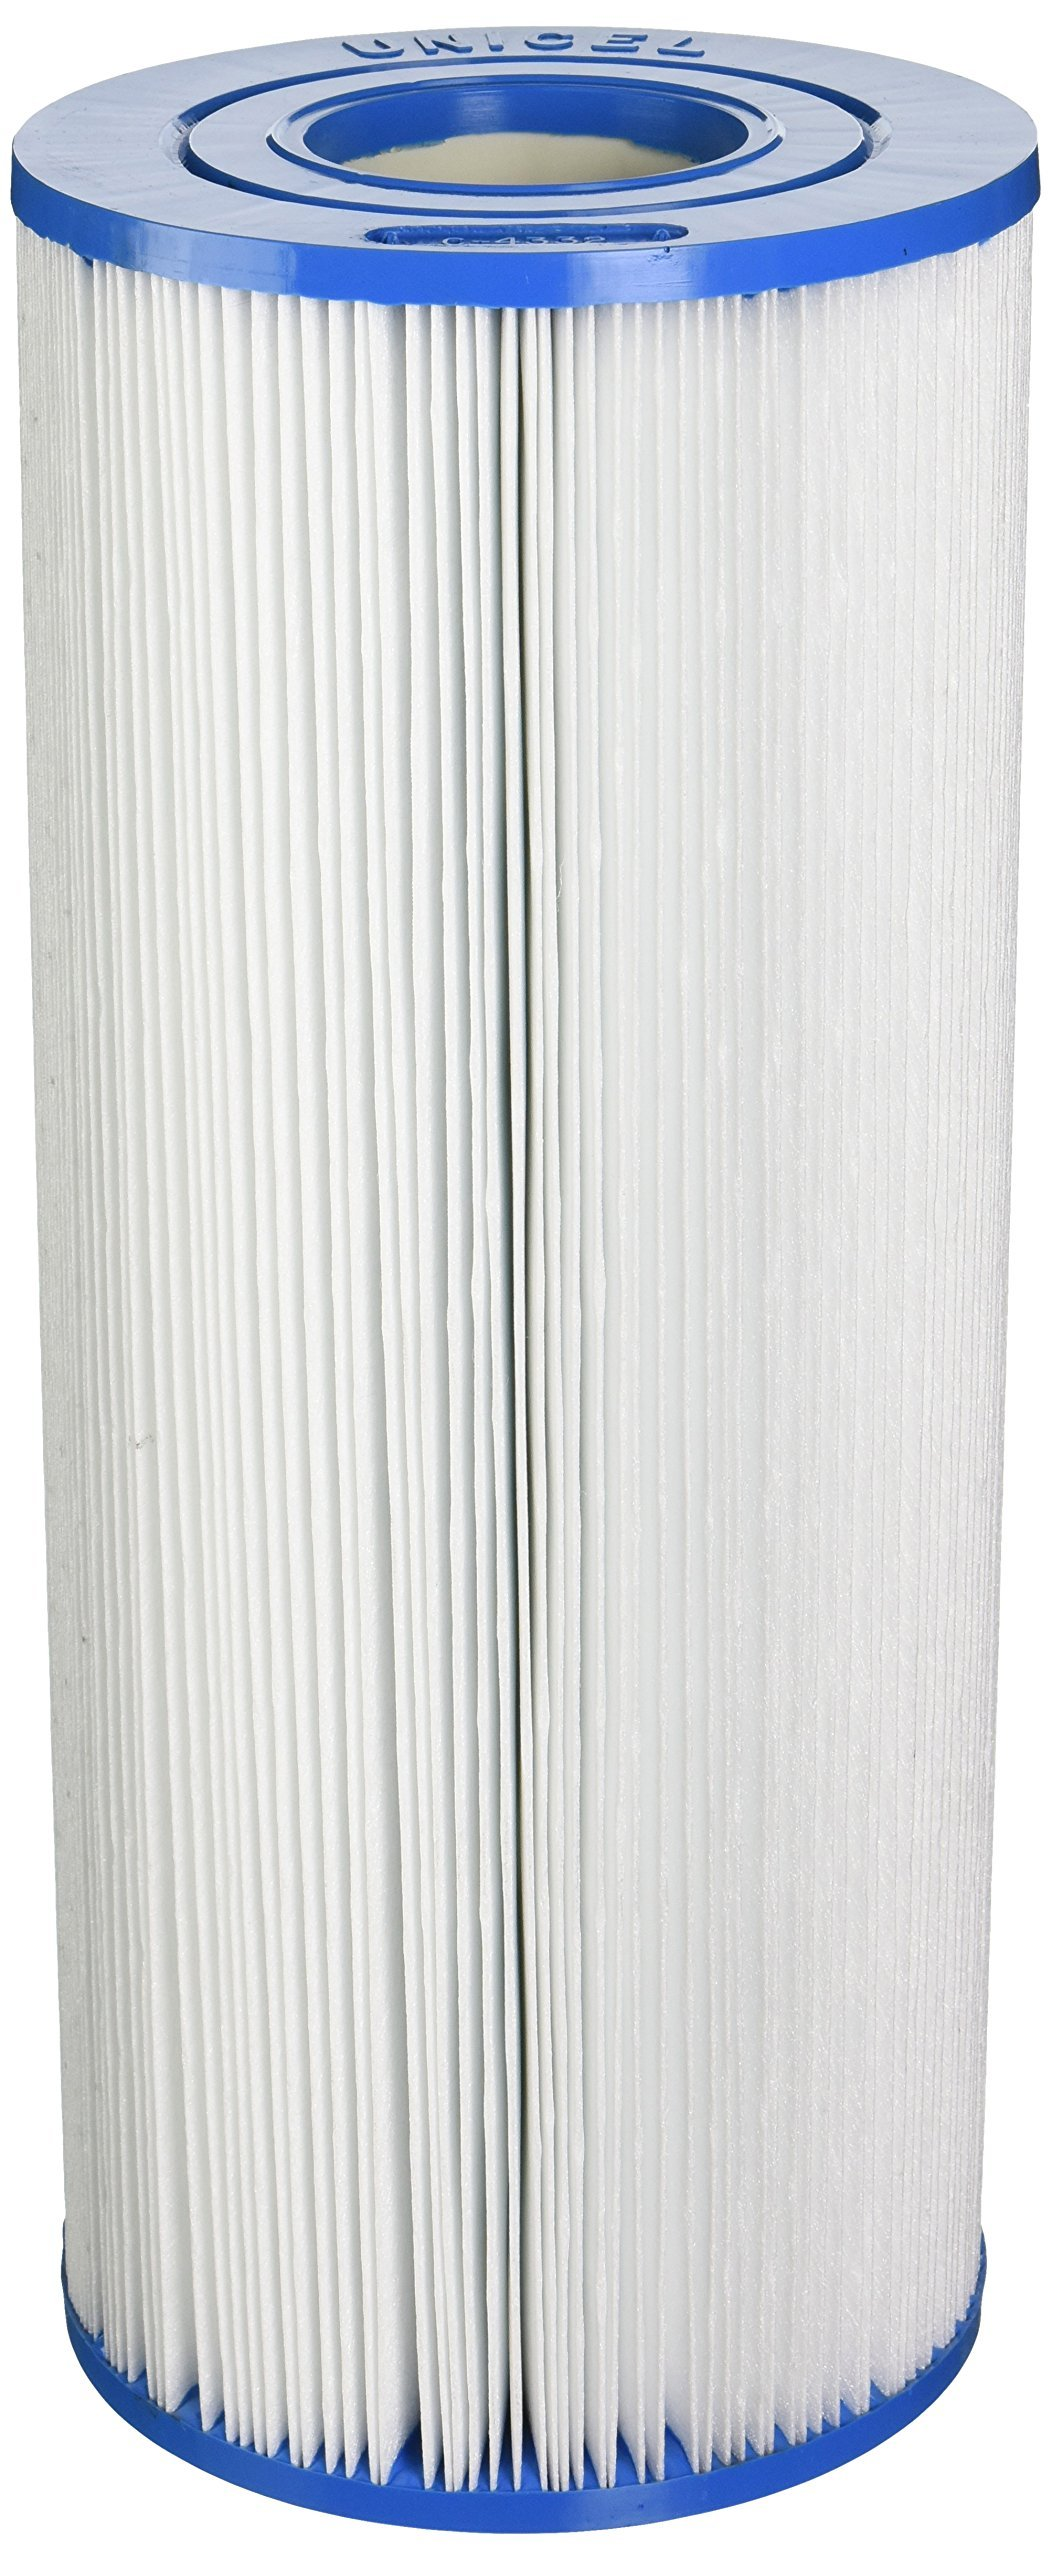 Unicel C-4332 Replacement Filter Cartridge for 32 Square Foot Martec, Sonfarrel, Advantage Mfg